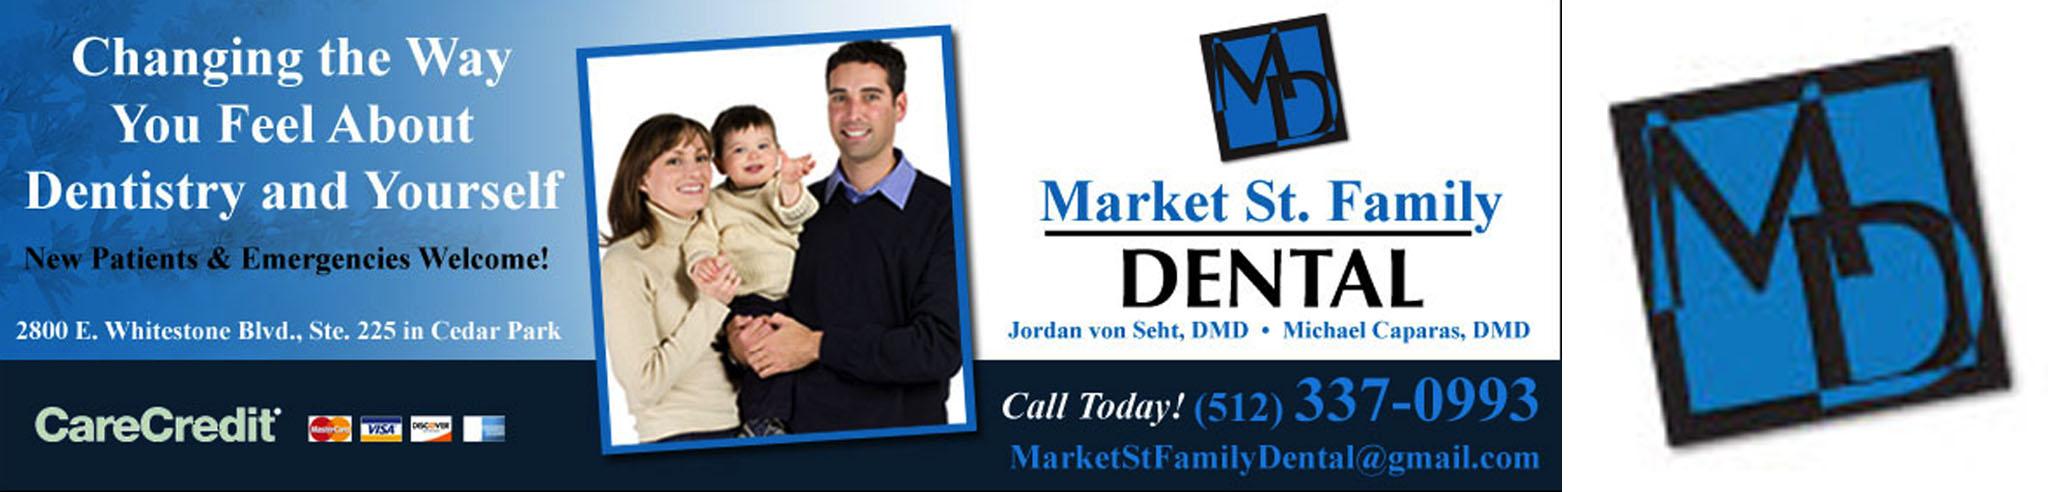 Market St  Family Dental | Flickr